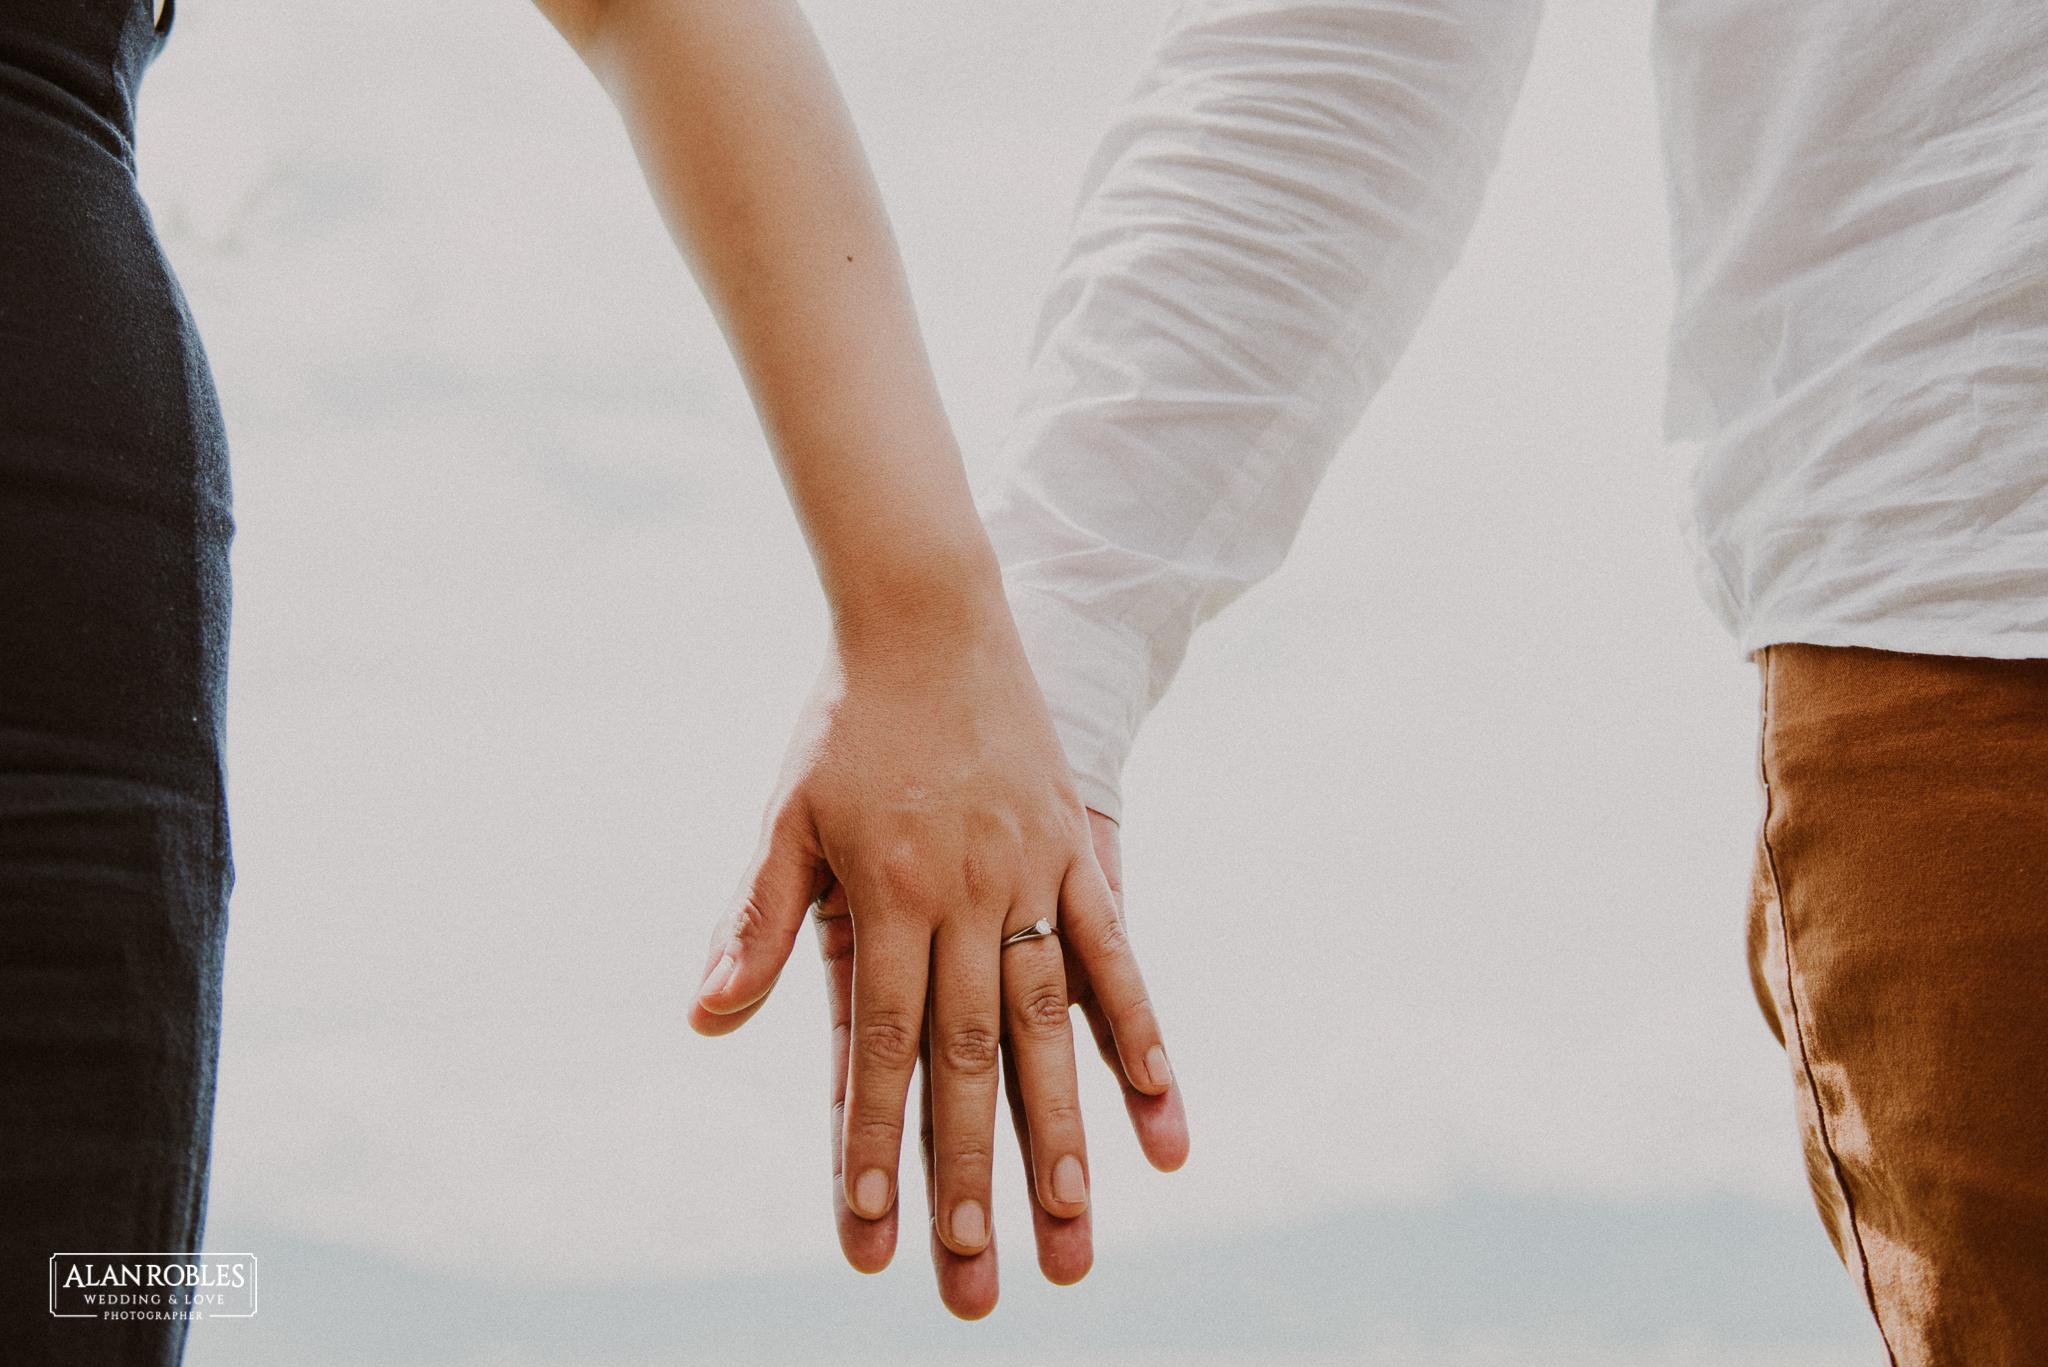 Sesion de fotos Preboda en Laguna de Ajijic. Fotografia de bodas - Alan Robles Wedding & Love Photographer, Fotografo de bodas en Guadalajara. Fotos creativas para boda. Ideas para fotos de boda. Anillo de compromiso.